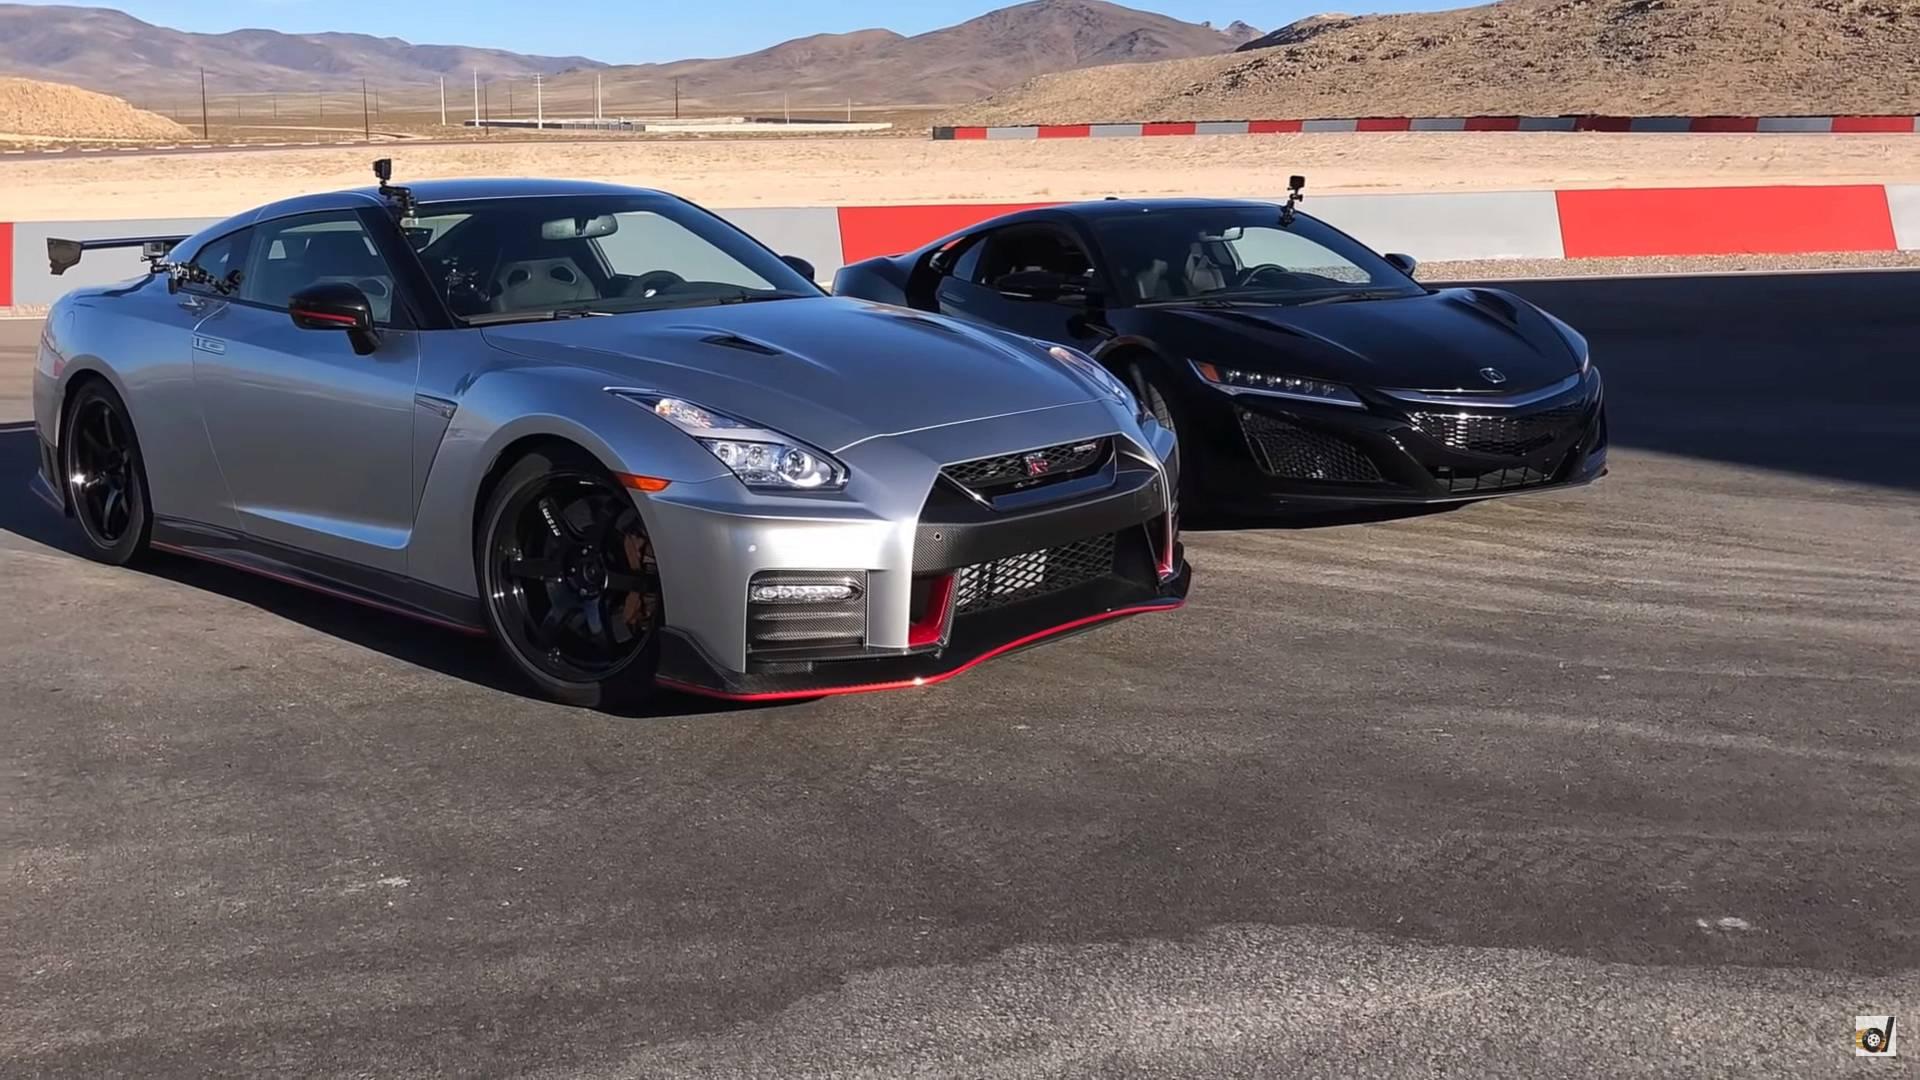 Nissan GT-R Nismo vs Acura NSX (VIDEO)